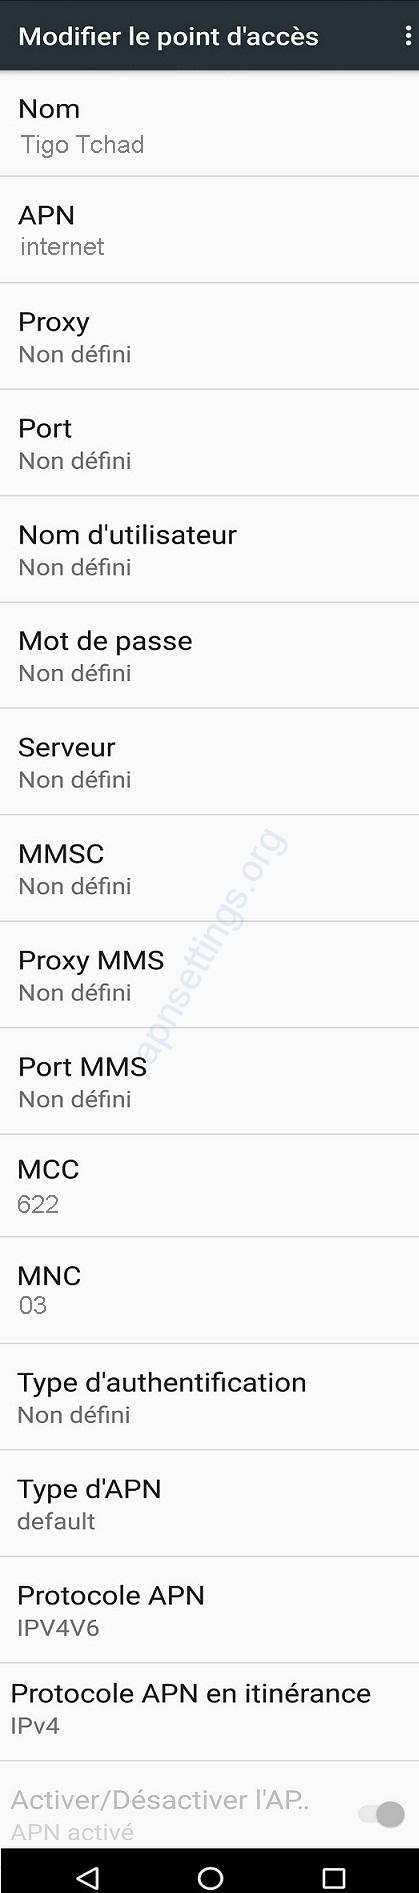 Configuration internet gratuit de Tigo Tchad